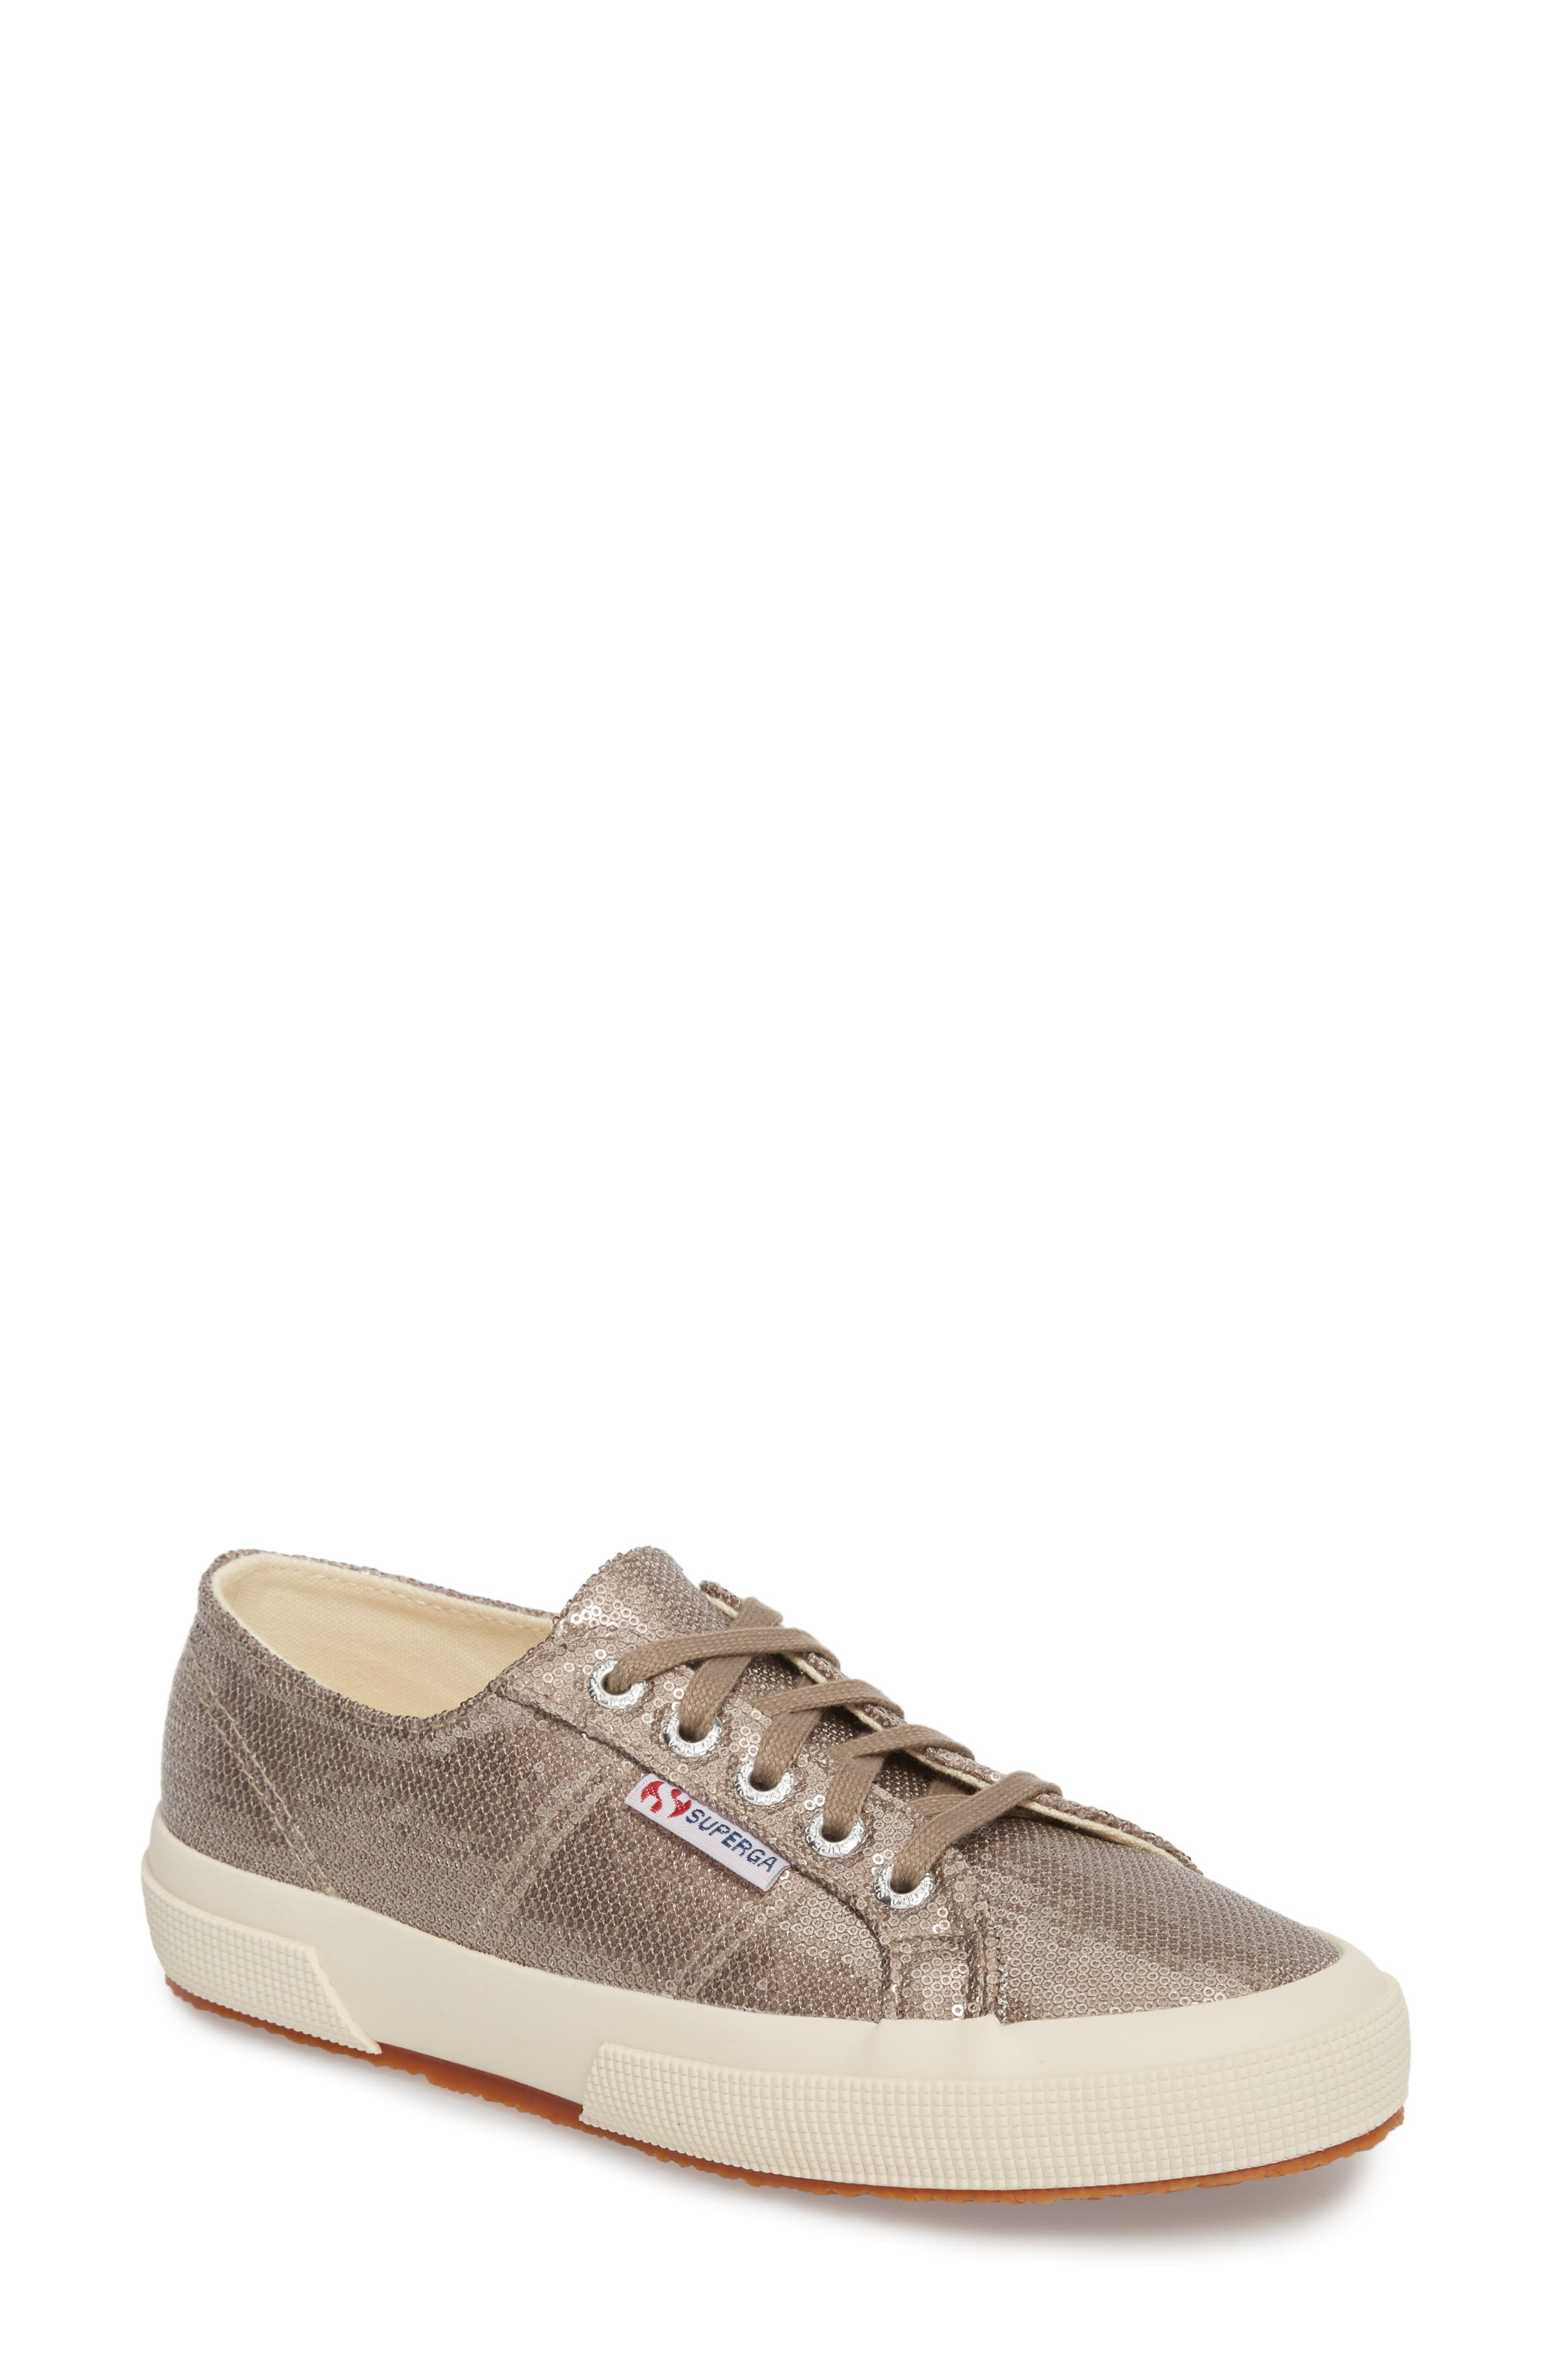 2750 Micro Sequin Sneaker,                             Main thumbnail 1, color,